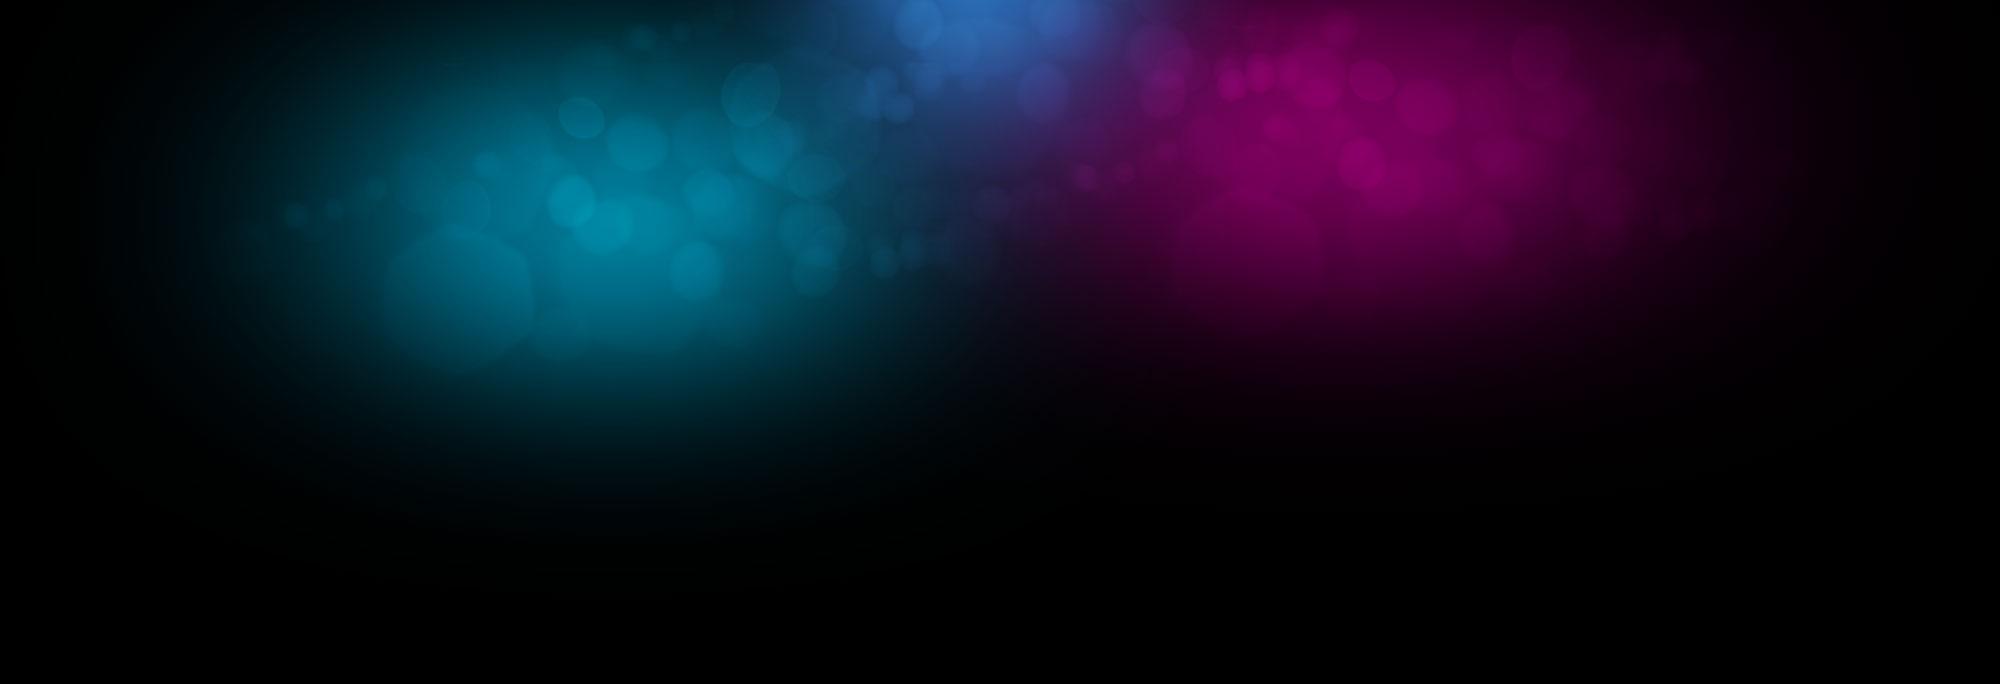 bg-color-biru-ungu